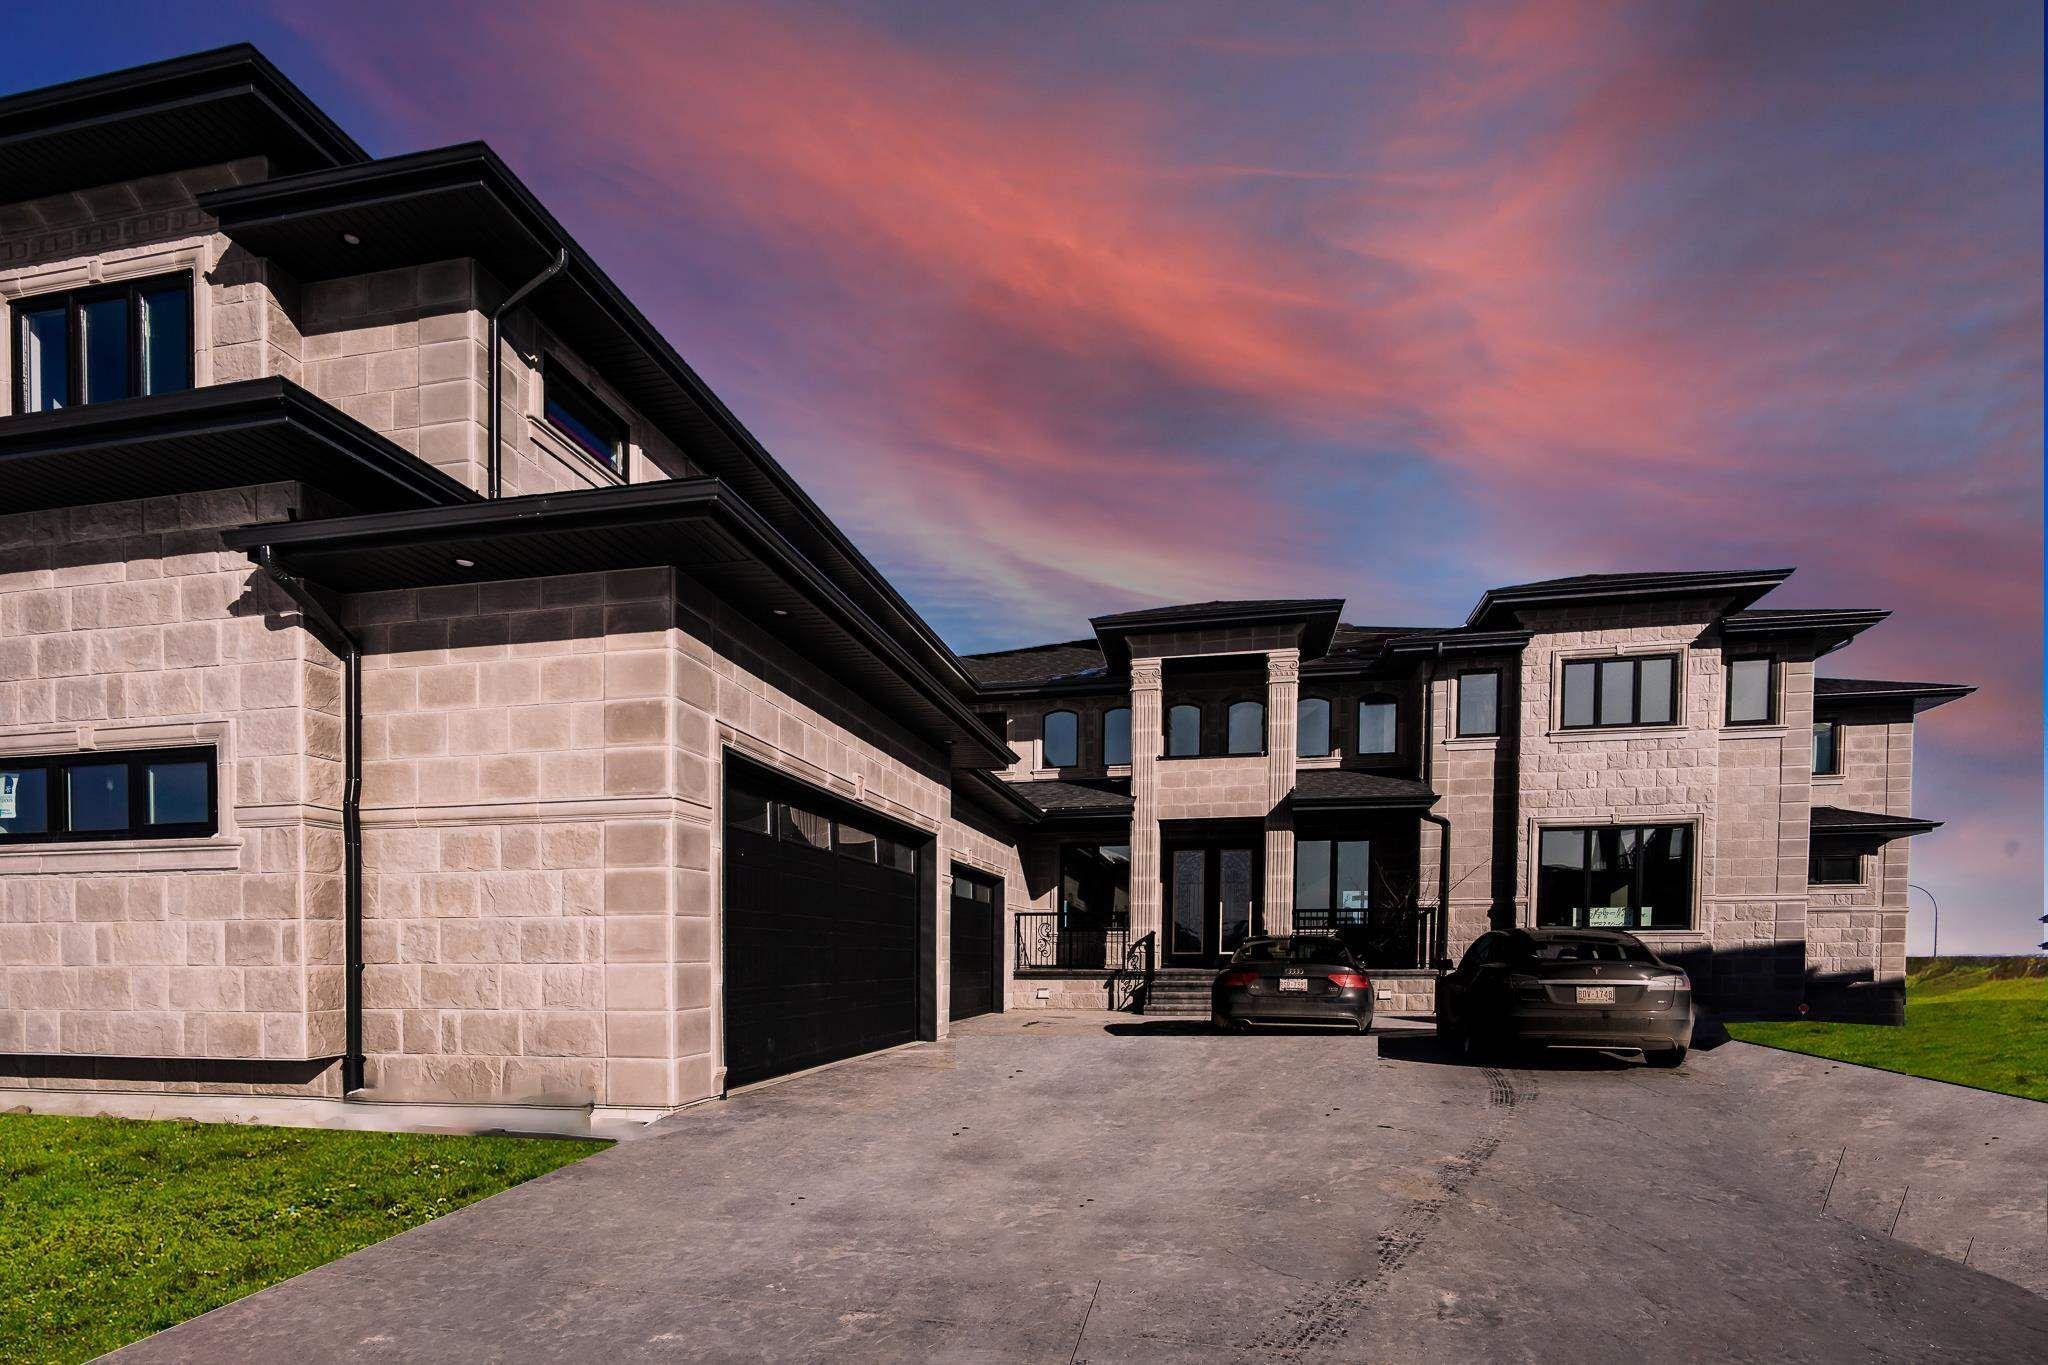 Main Photo: 944 166 Avenue in Edmonton: Zone 51 House for sale : MLS®# E4245782